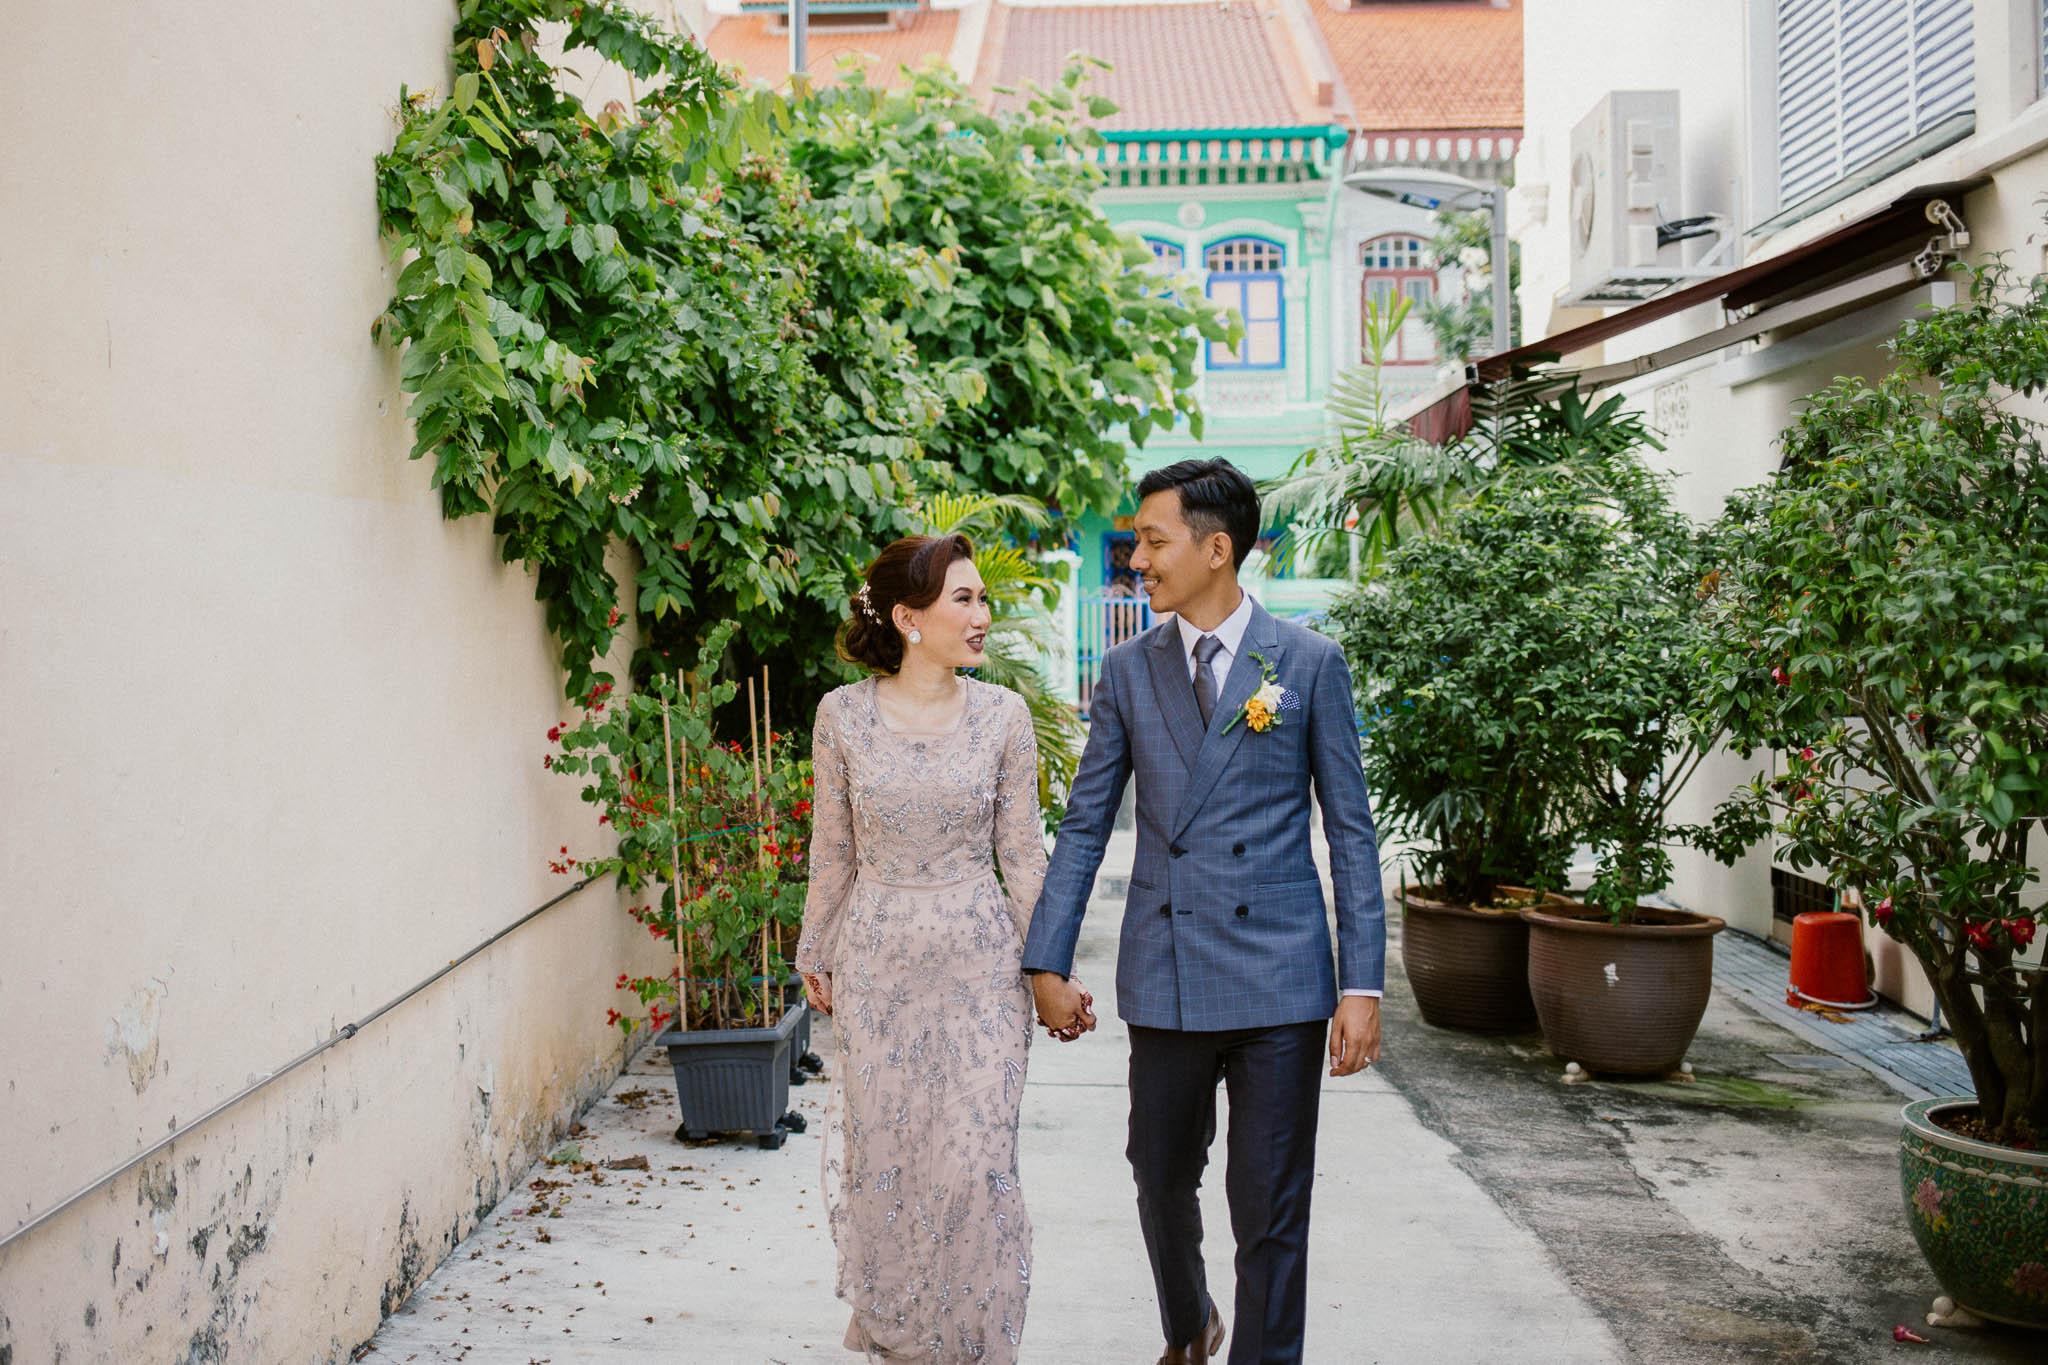 singapore-wedding-photographer-wedding-nufail-addafiq-087.jpg